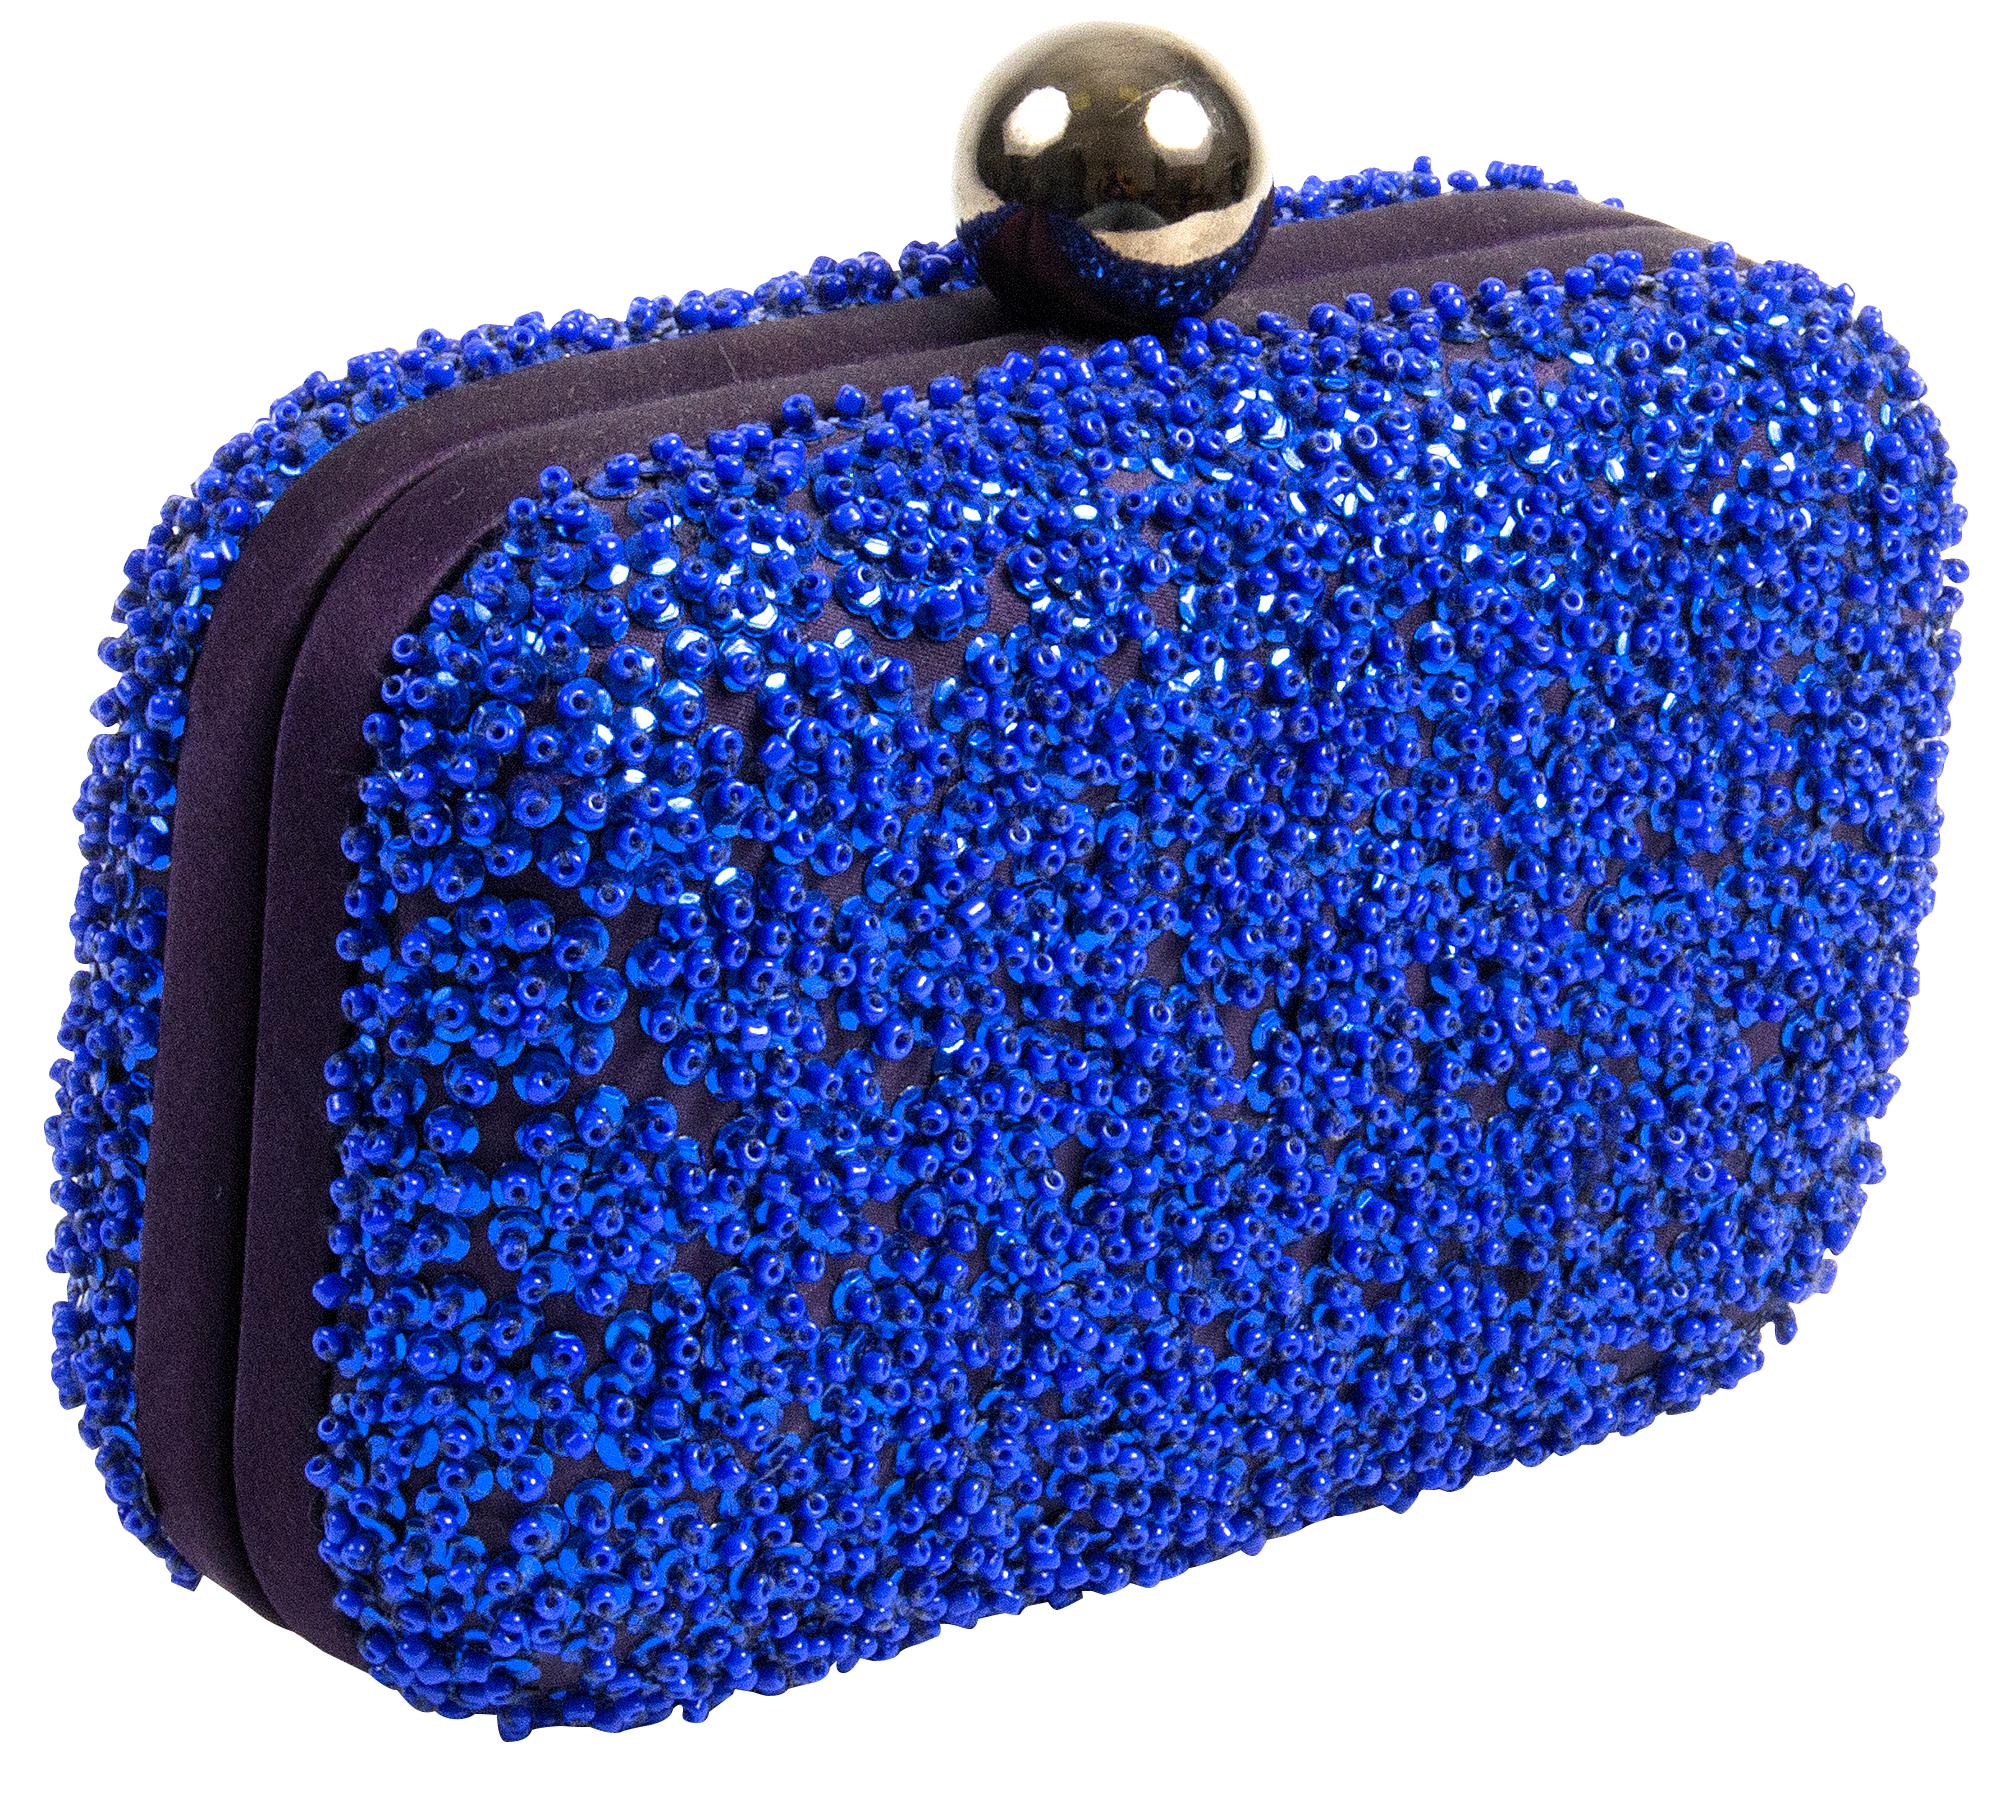 Santi evening bag, $245 at Gwynn's of Mount Pleasant